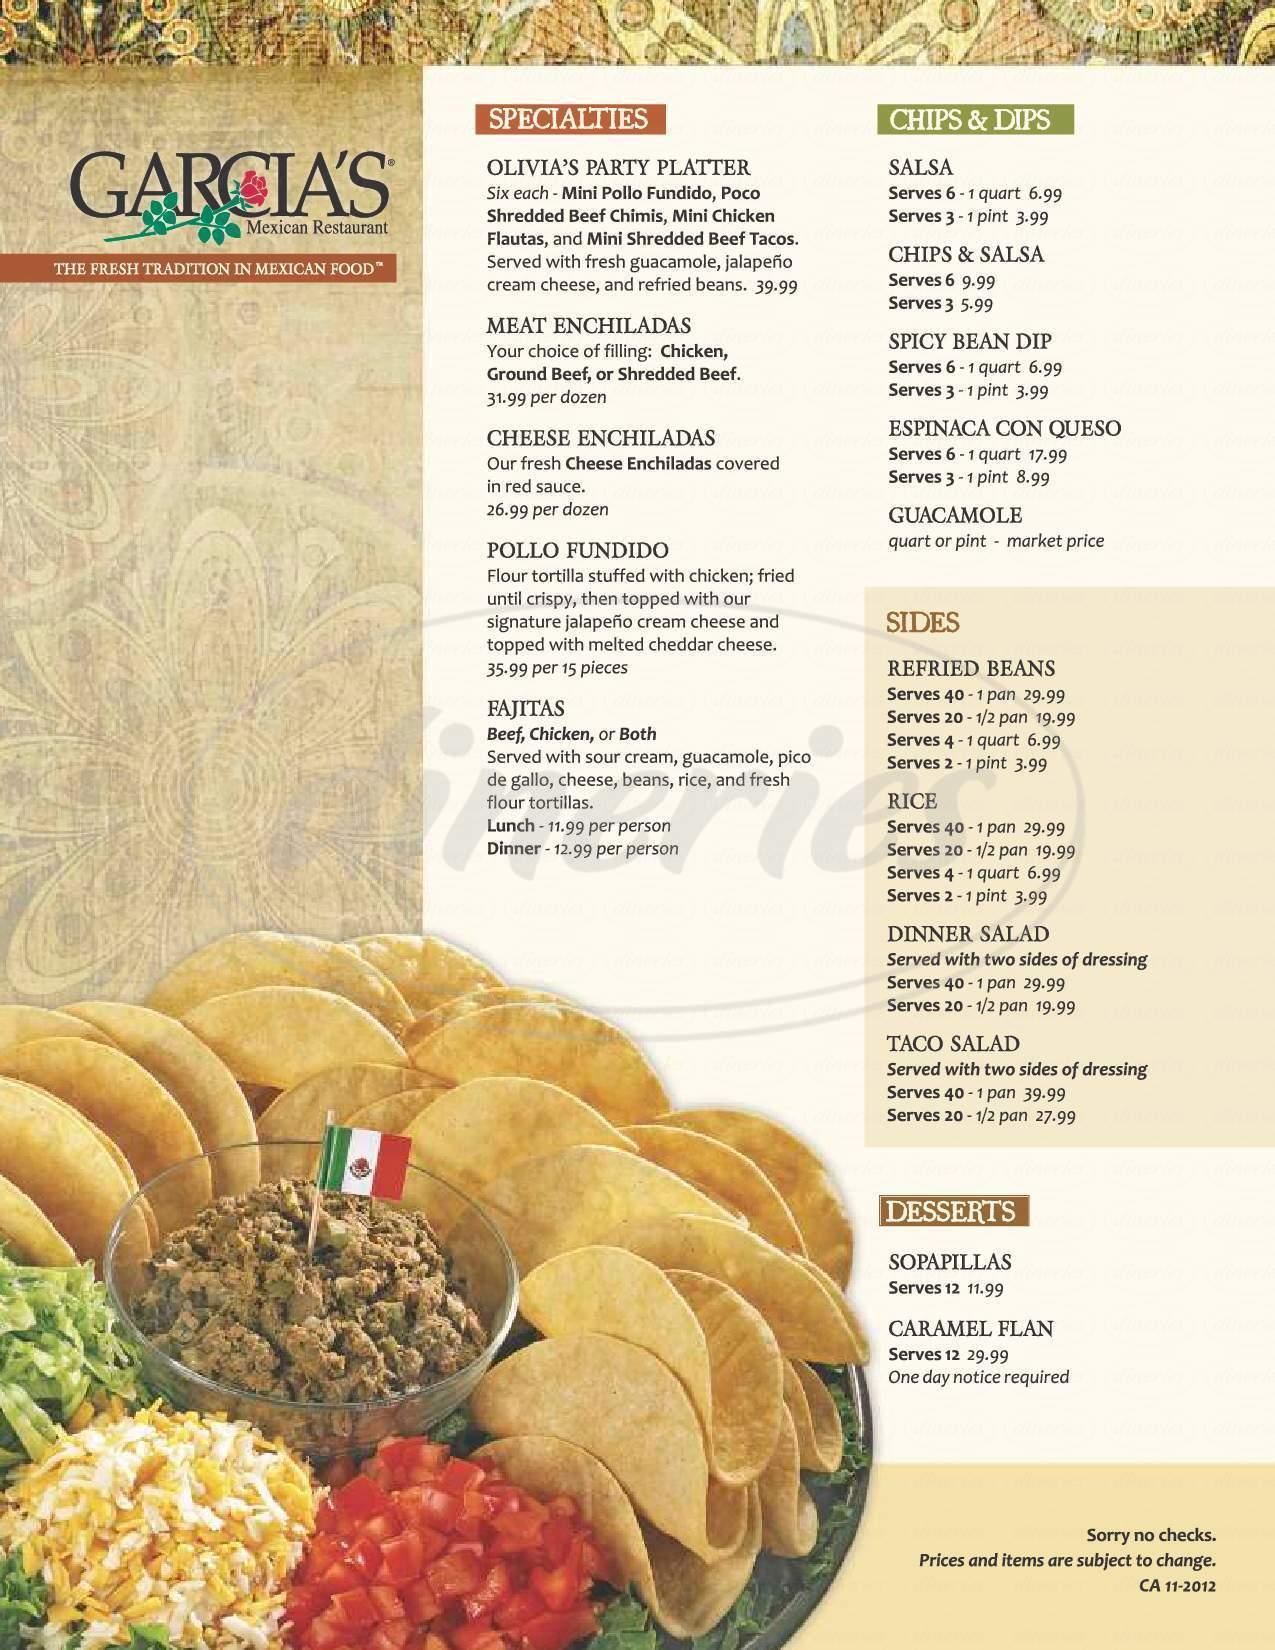 menu for Garcia's Mexican Restaurants